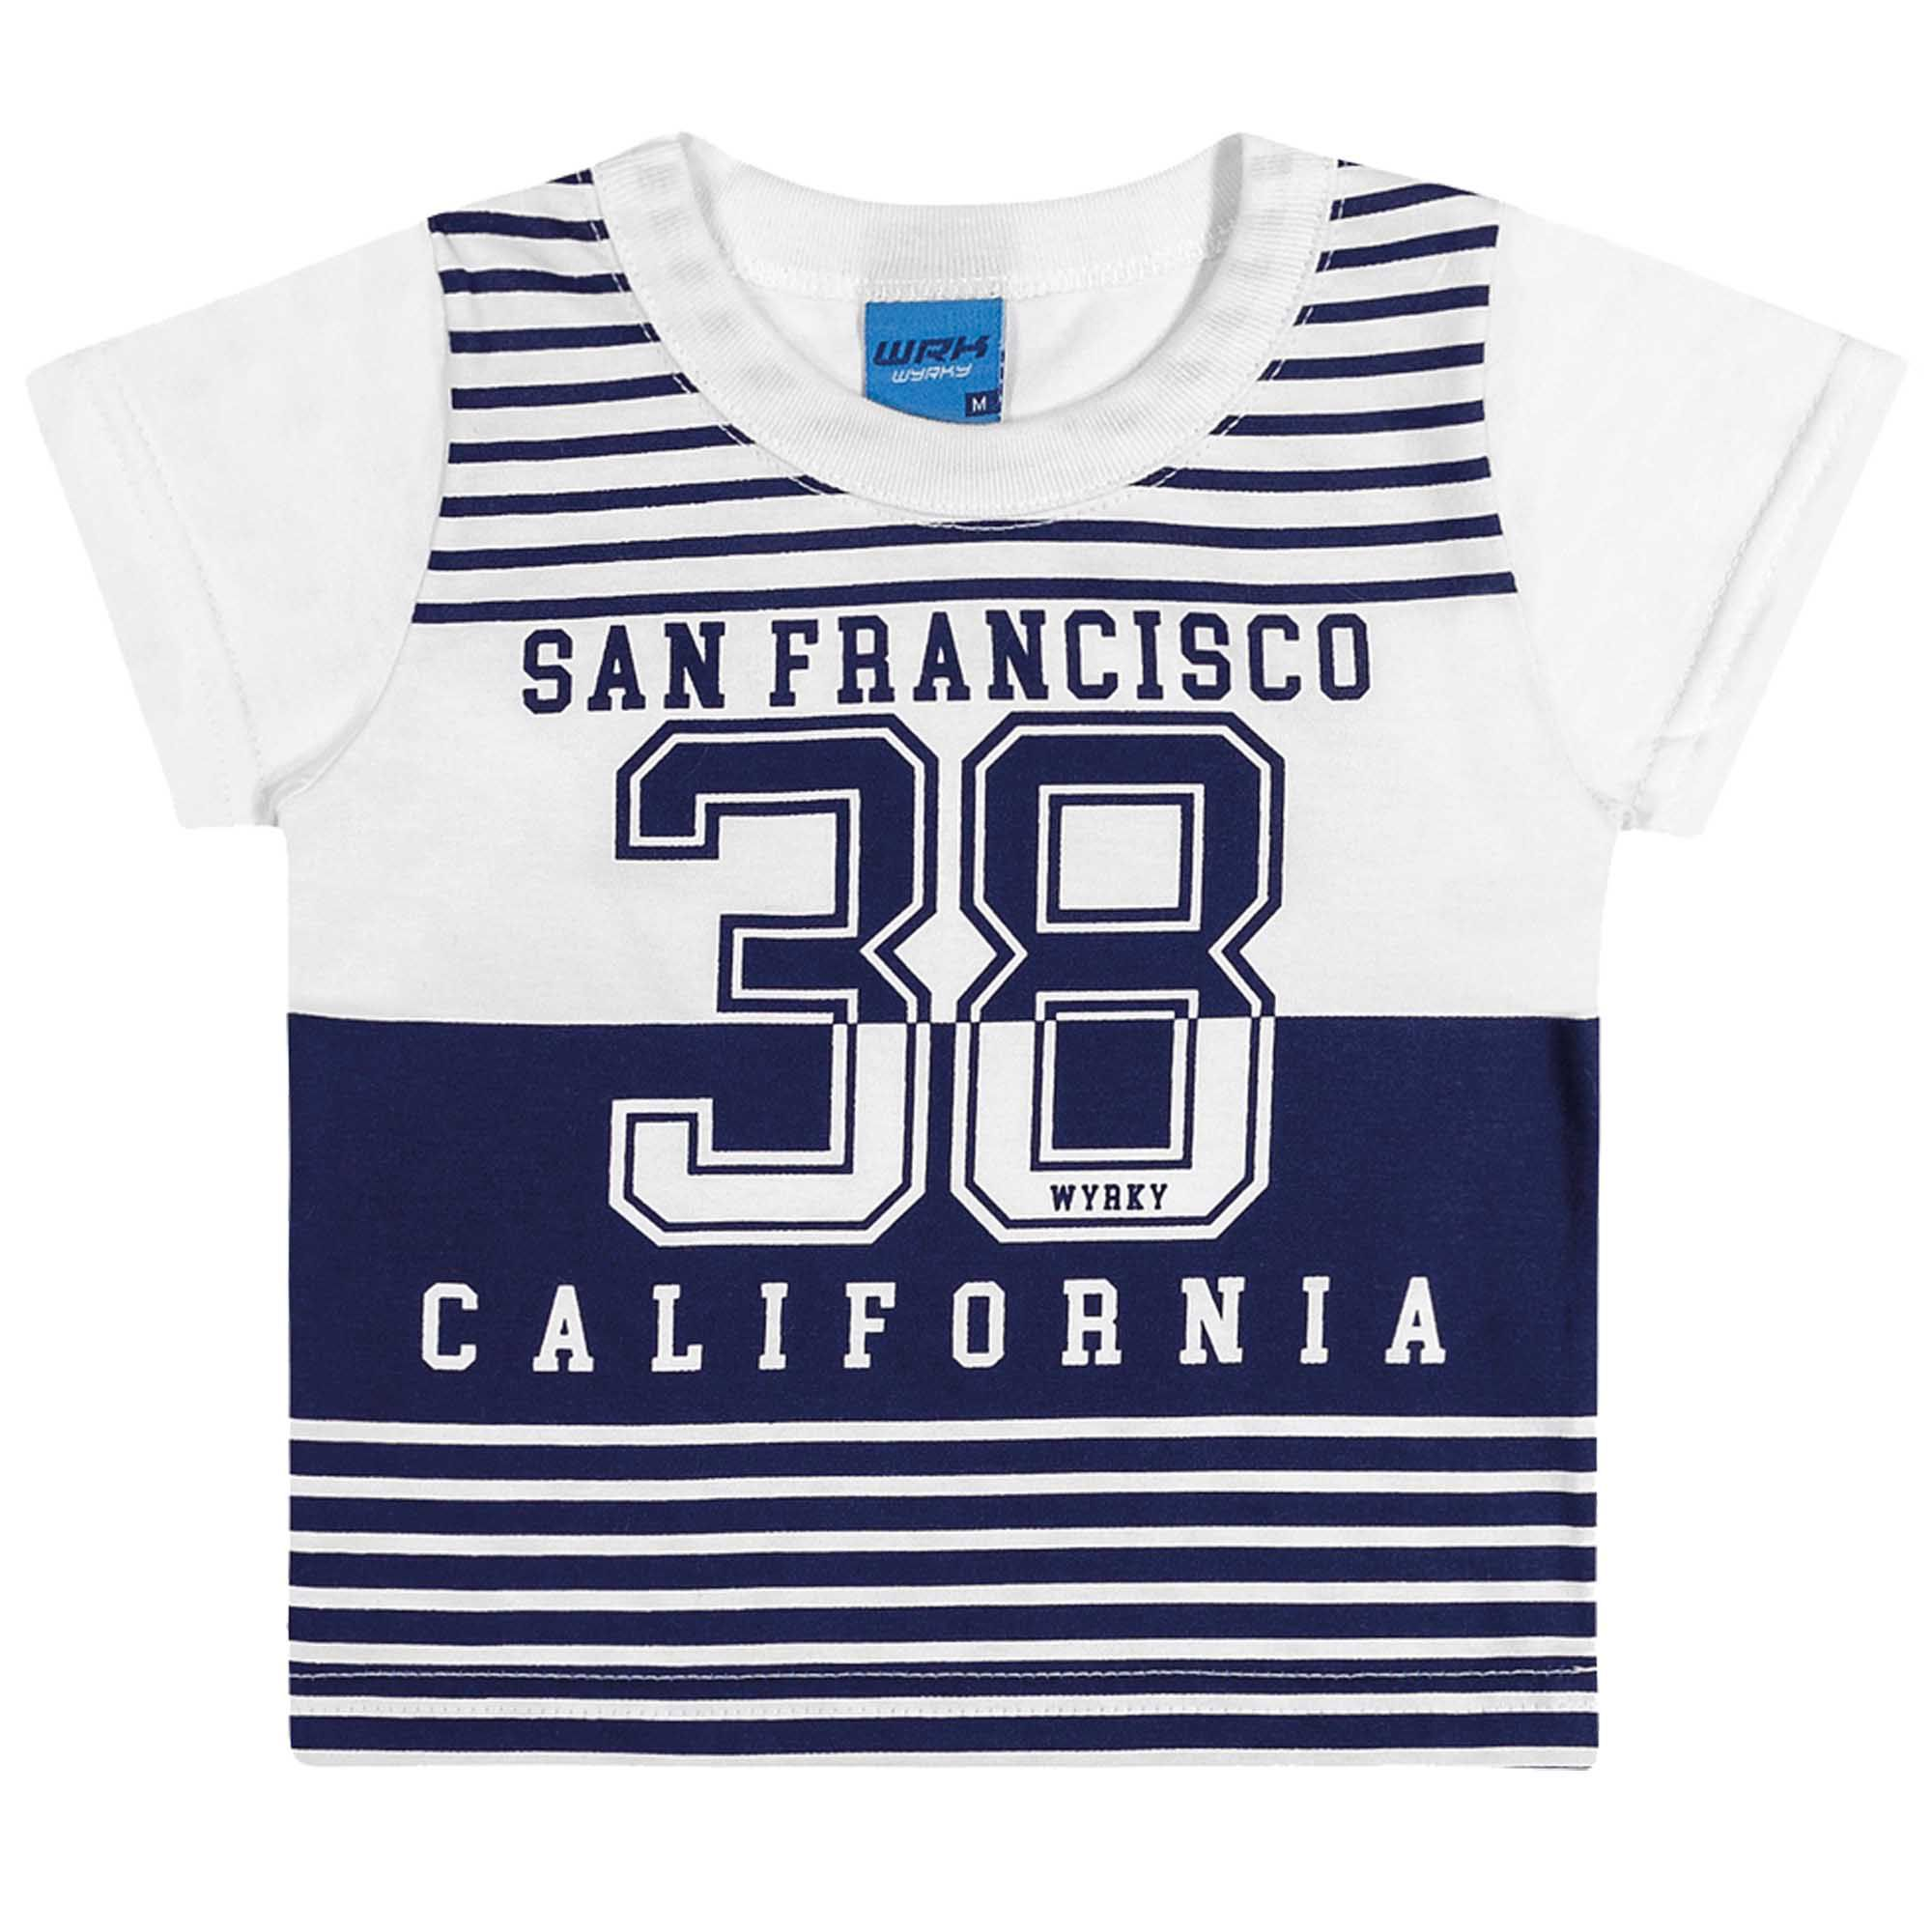 Camiseta Meia Manga Romitex Wyrky San Francisco 38 California - 1 ao 3